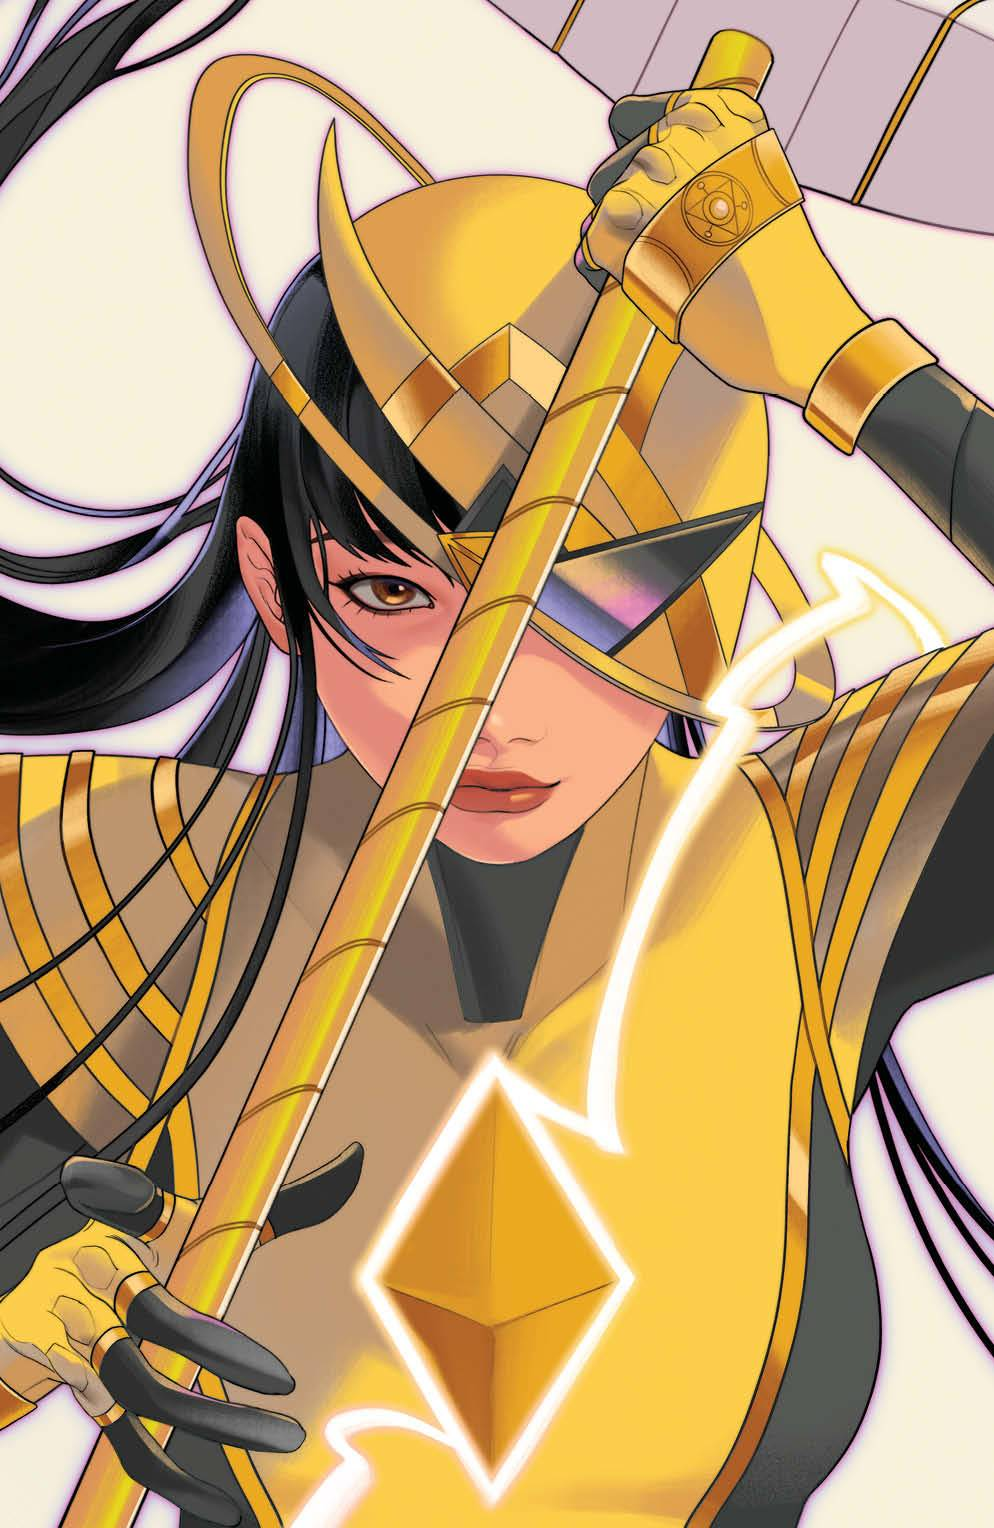 STL194185 ComicList: BOOM! Studios New Releases for 08/18/2021